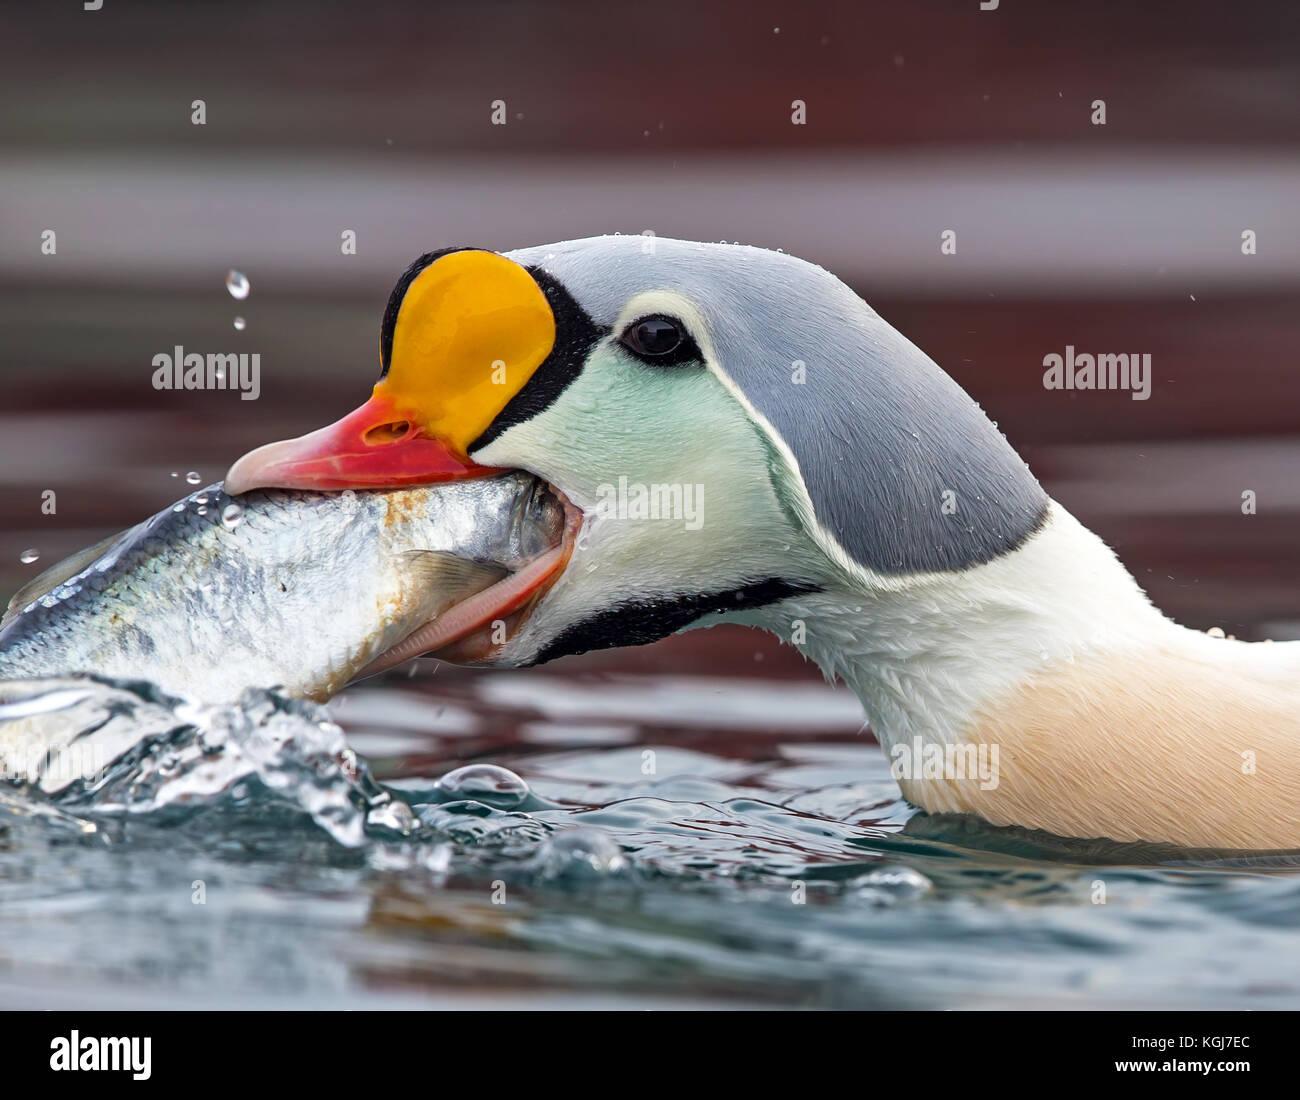 A greedy King Eider feeding on herring in Batsfjord harbor - Stock Image